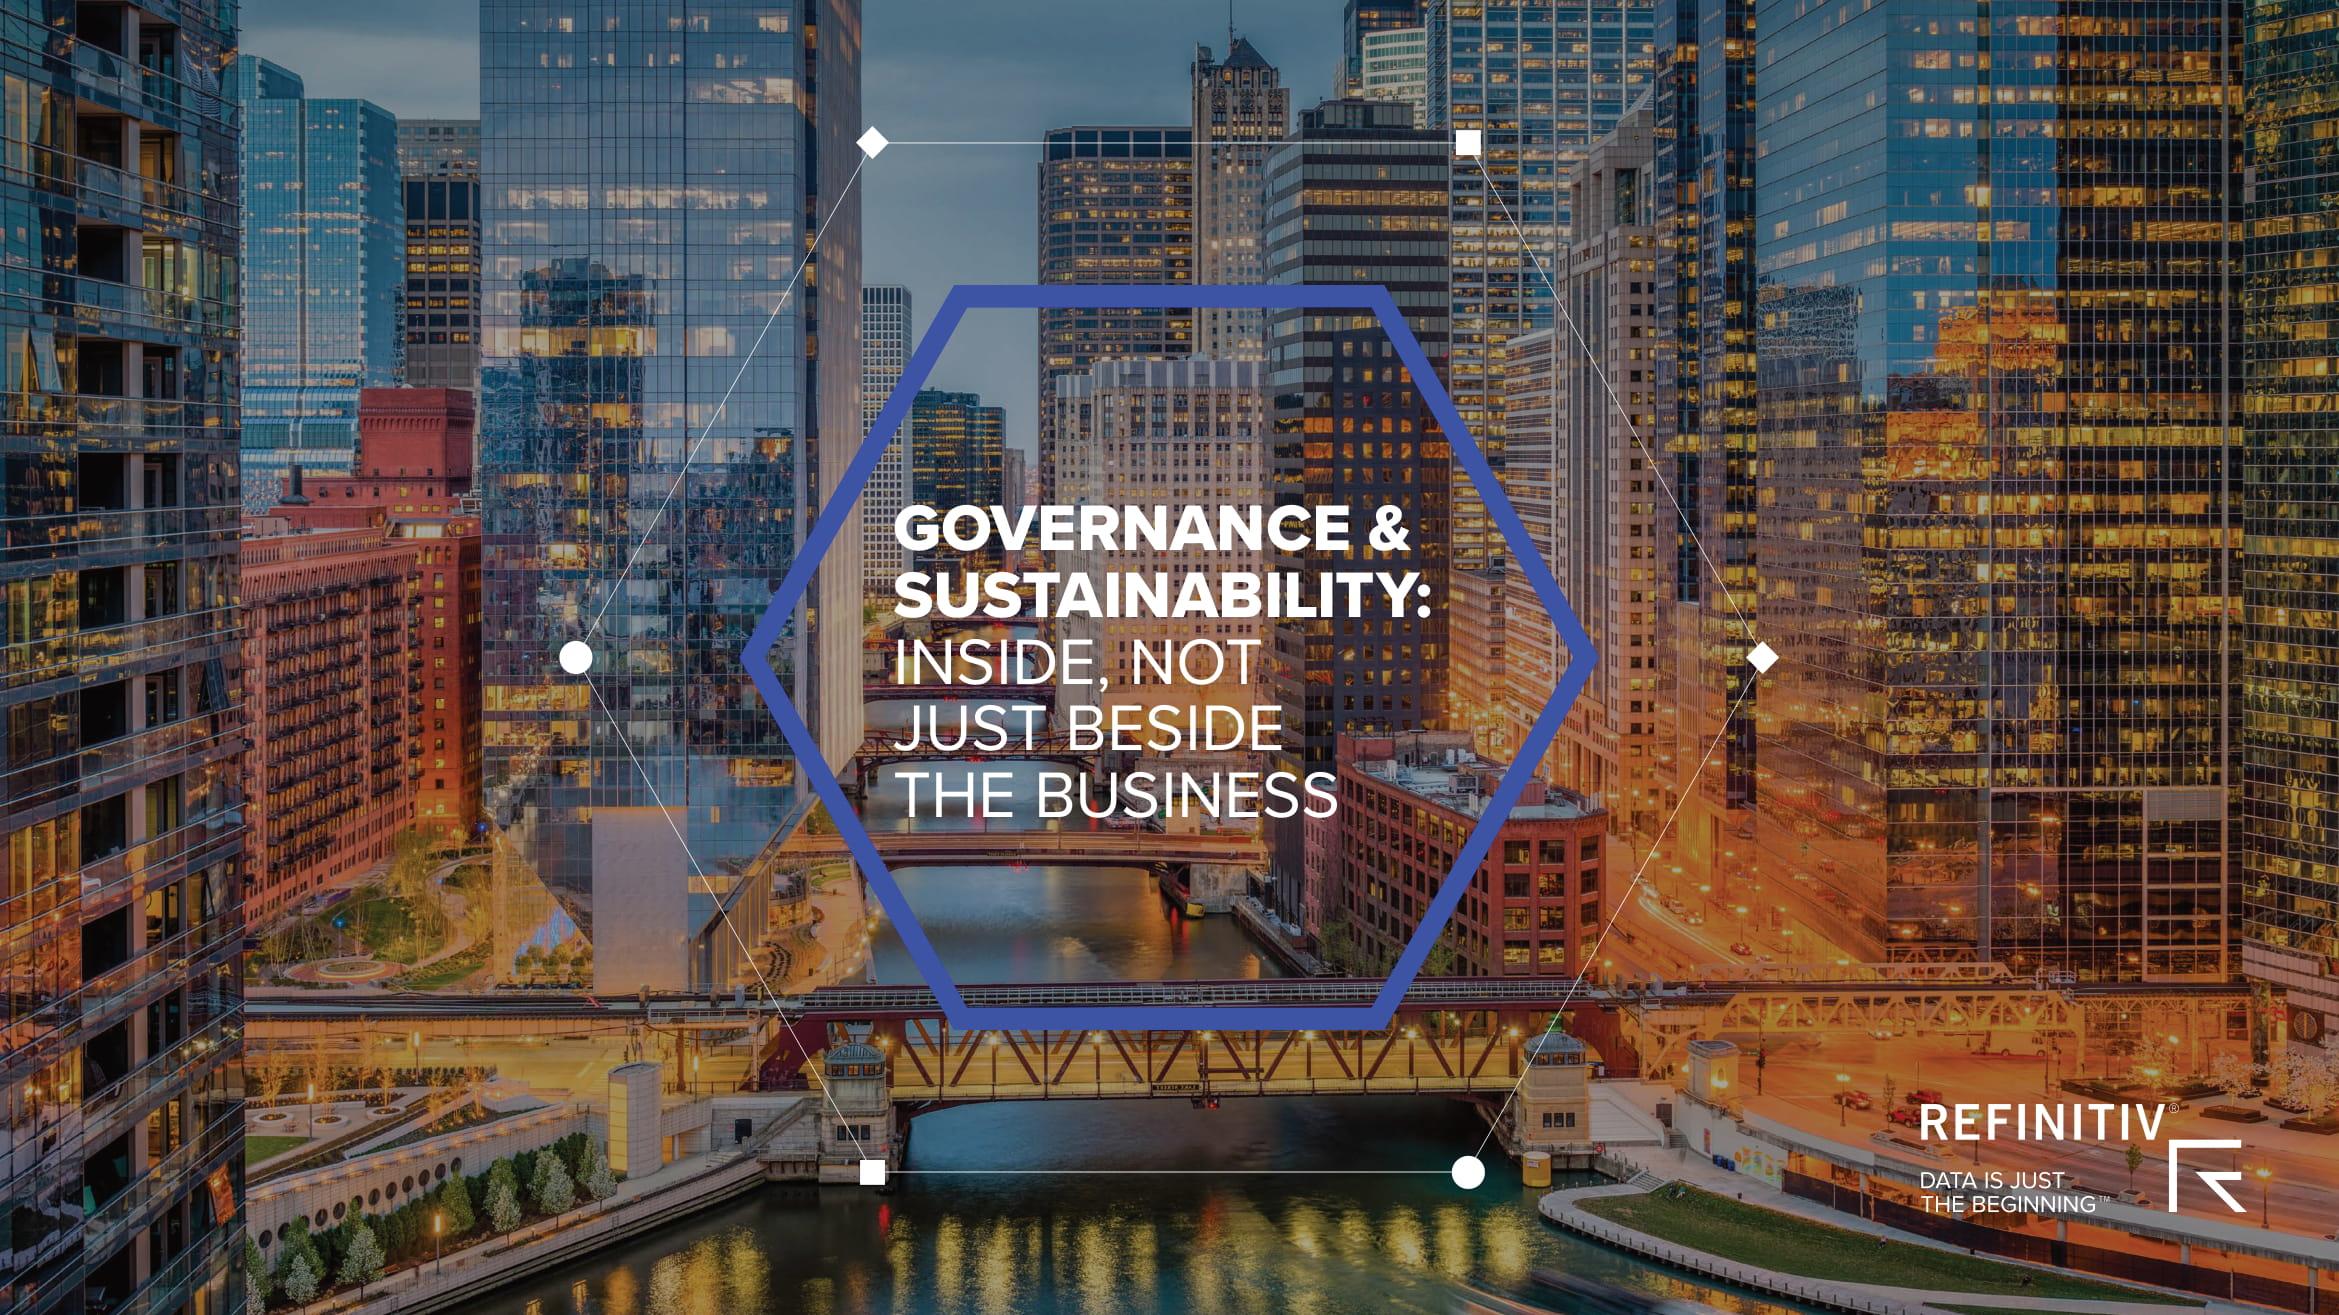 corporate governance analysis